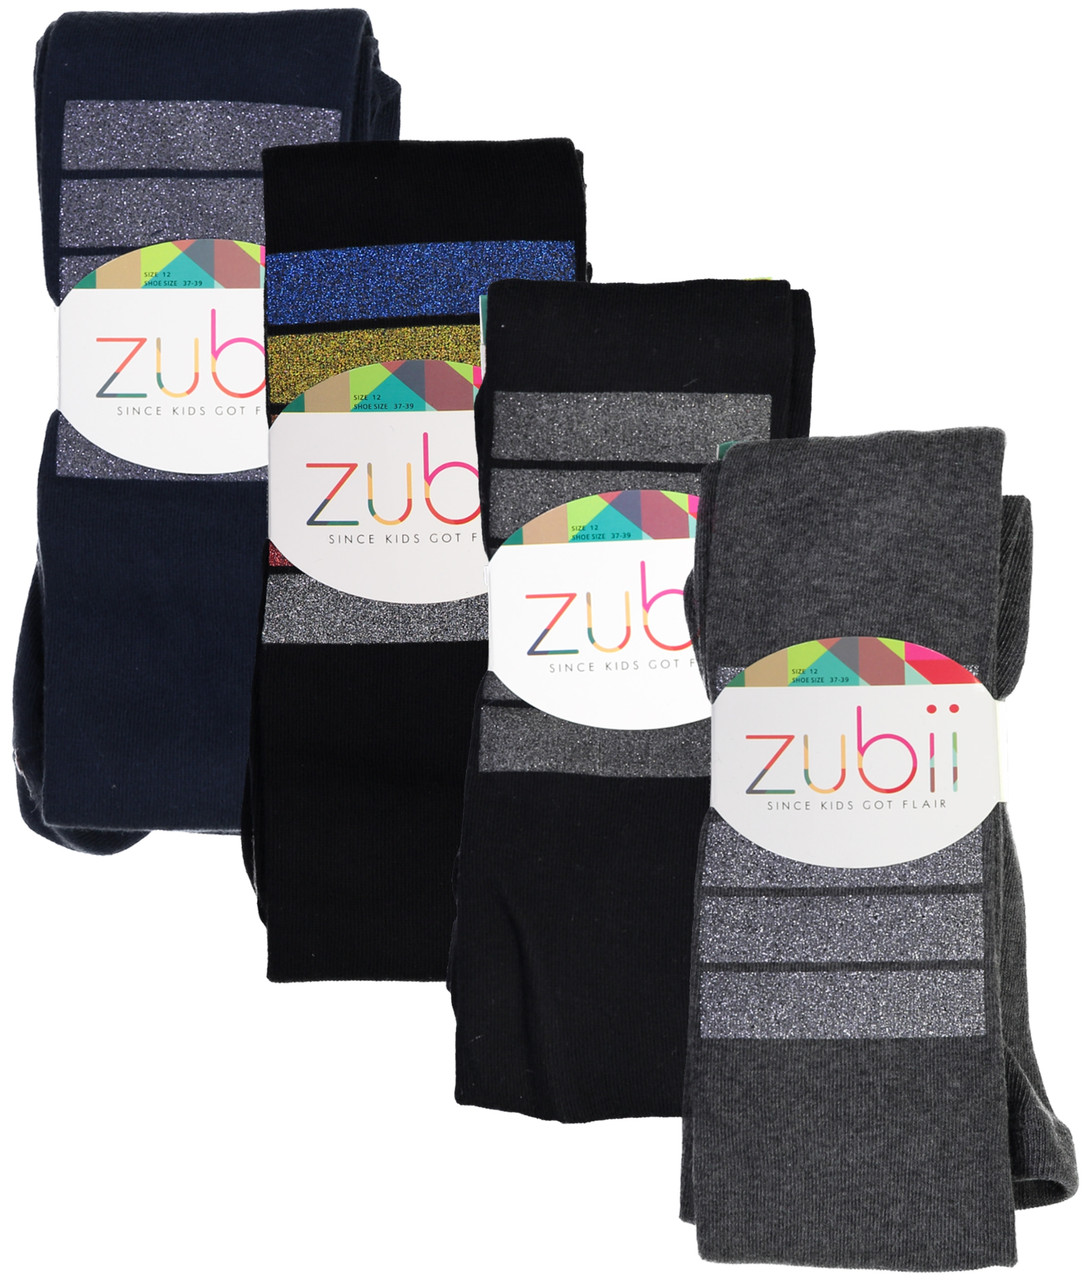 Zubii Girls Colorbar Cotton Tights - 530